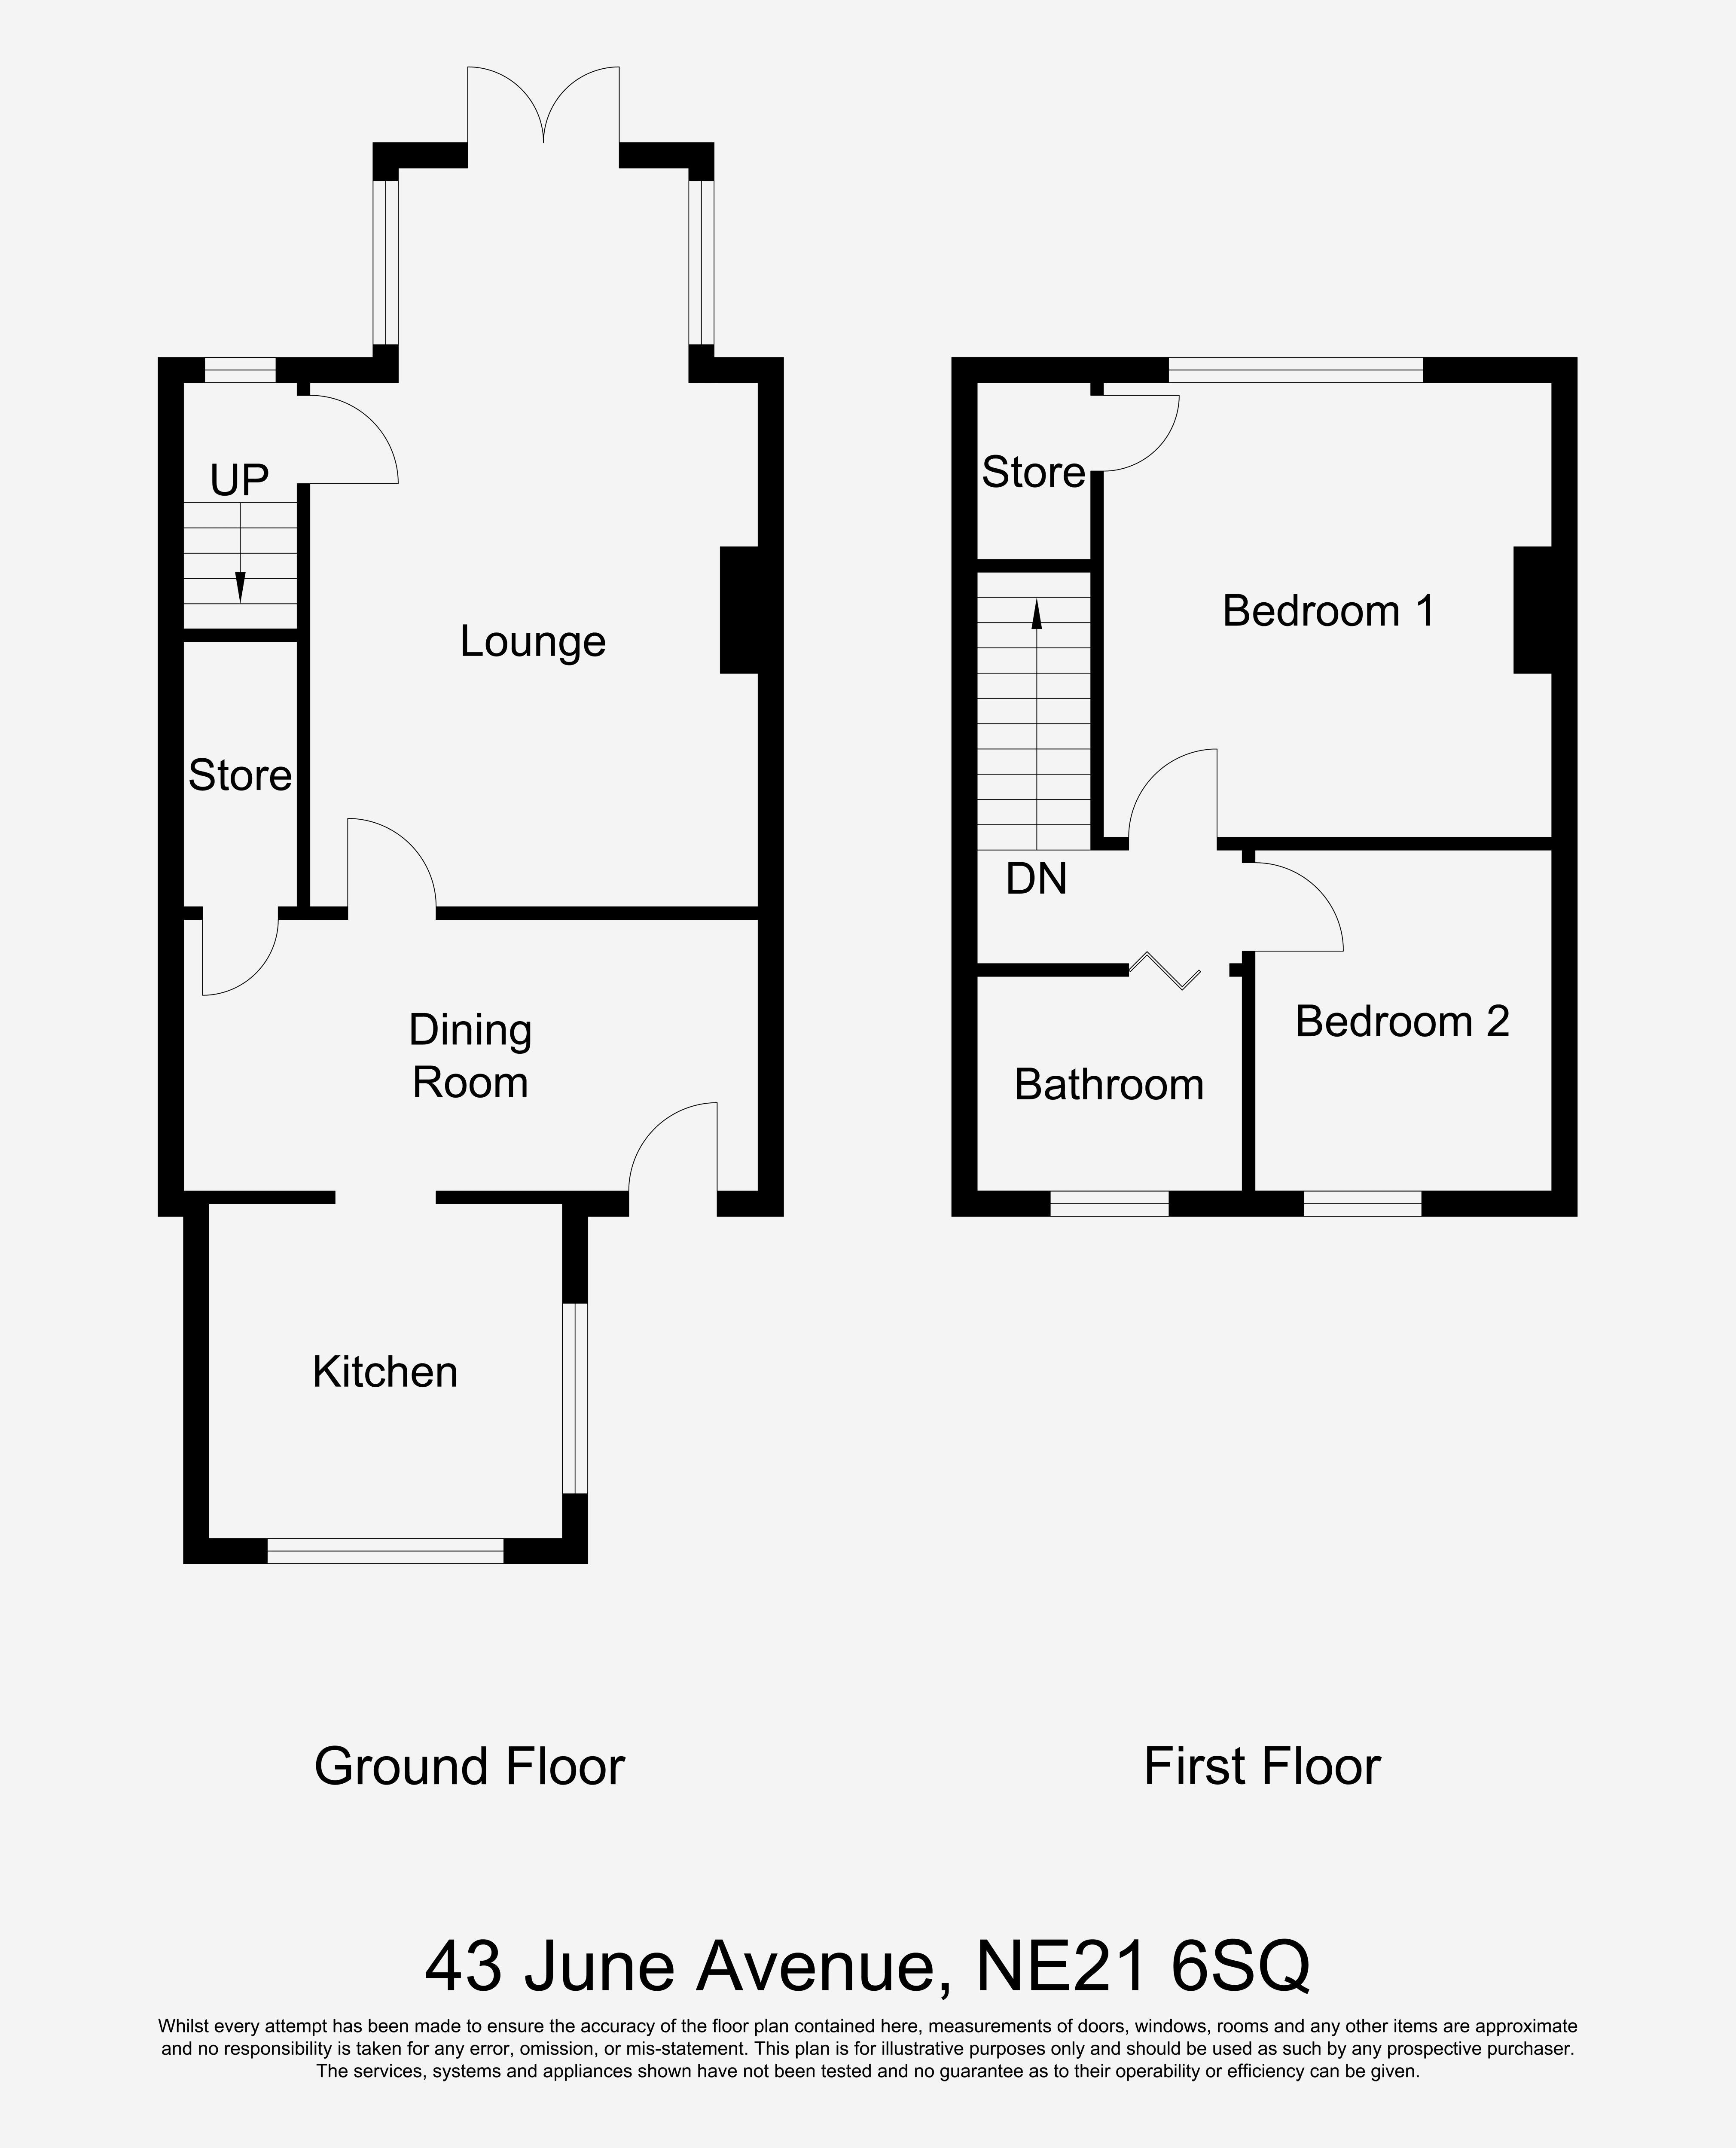 2 Bedroom House For Sale, June Avenue, Winlaton Mill, Blaydon-On-Tyne NE, Blaydon-on-tyne, NE21 6SQ